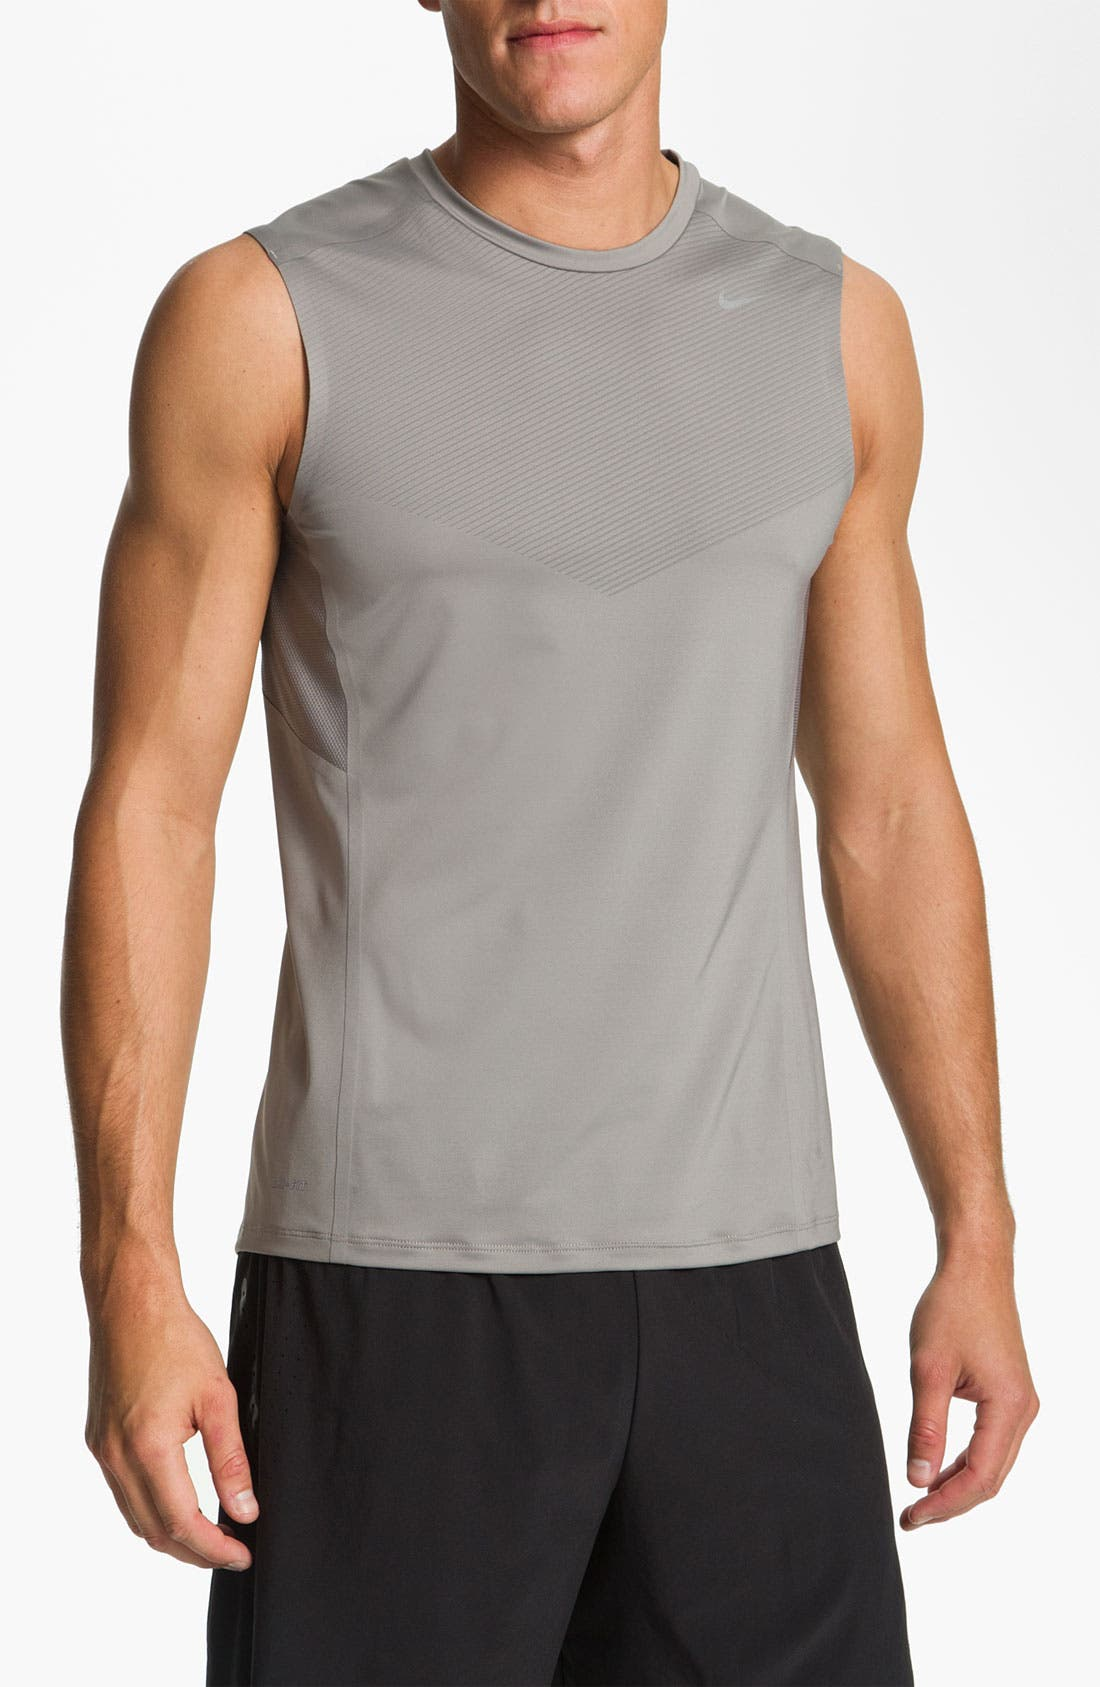 Alternate Image 1 Selected - Nike 'Swift Muscle' Sleeveless T-Shirt